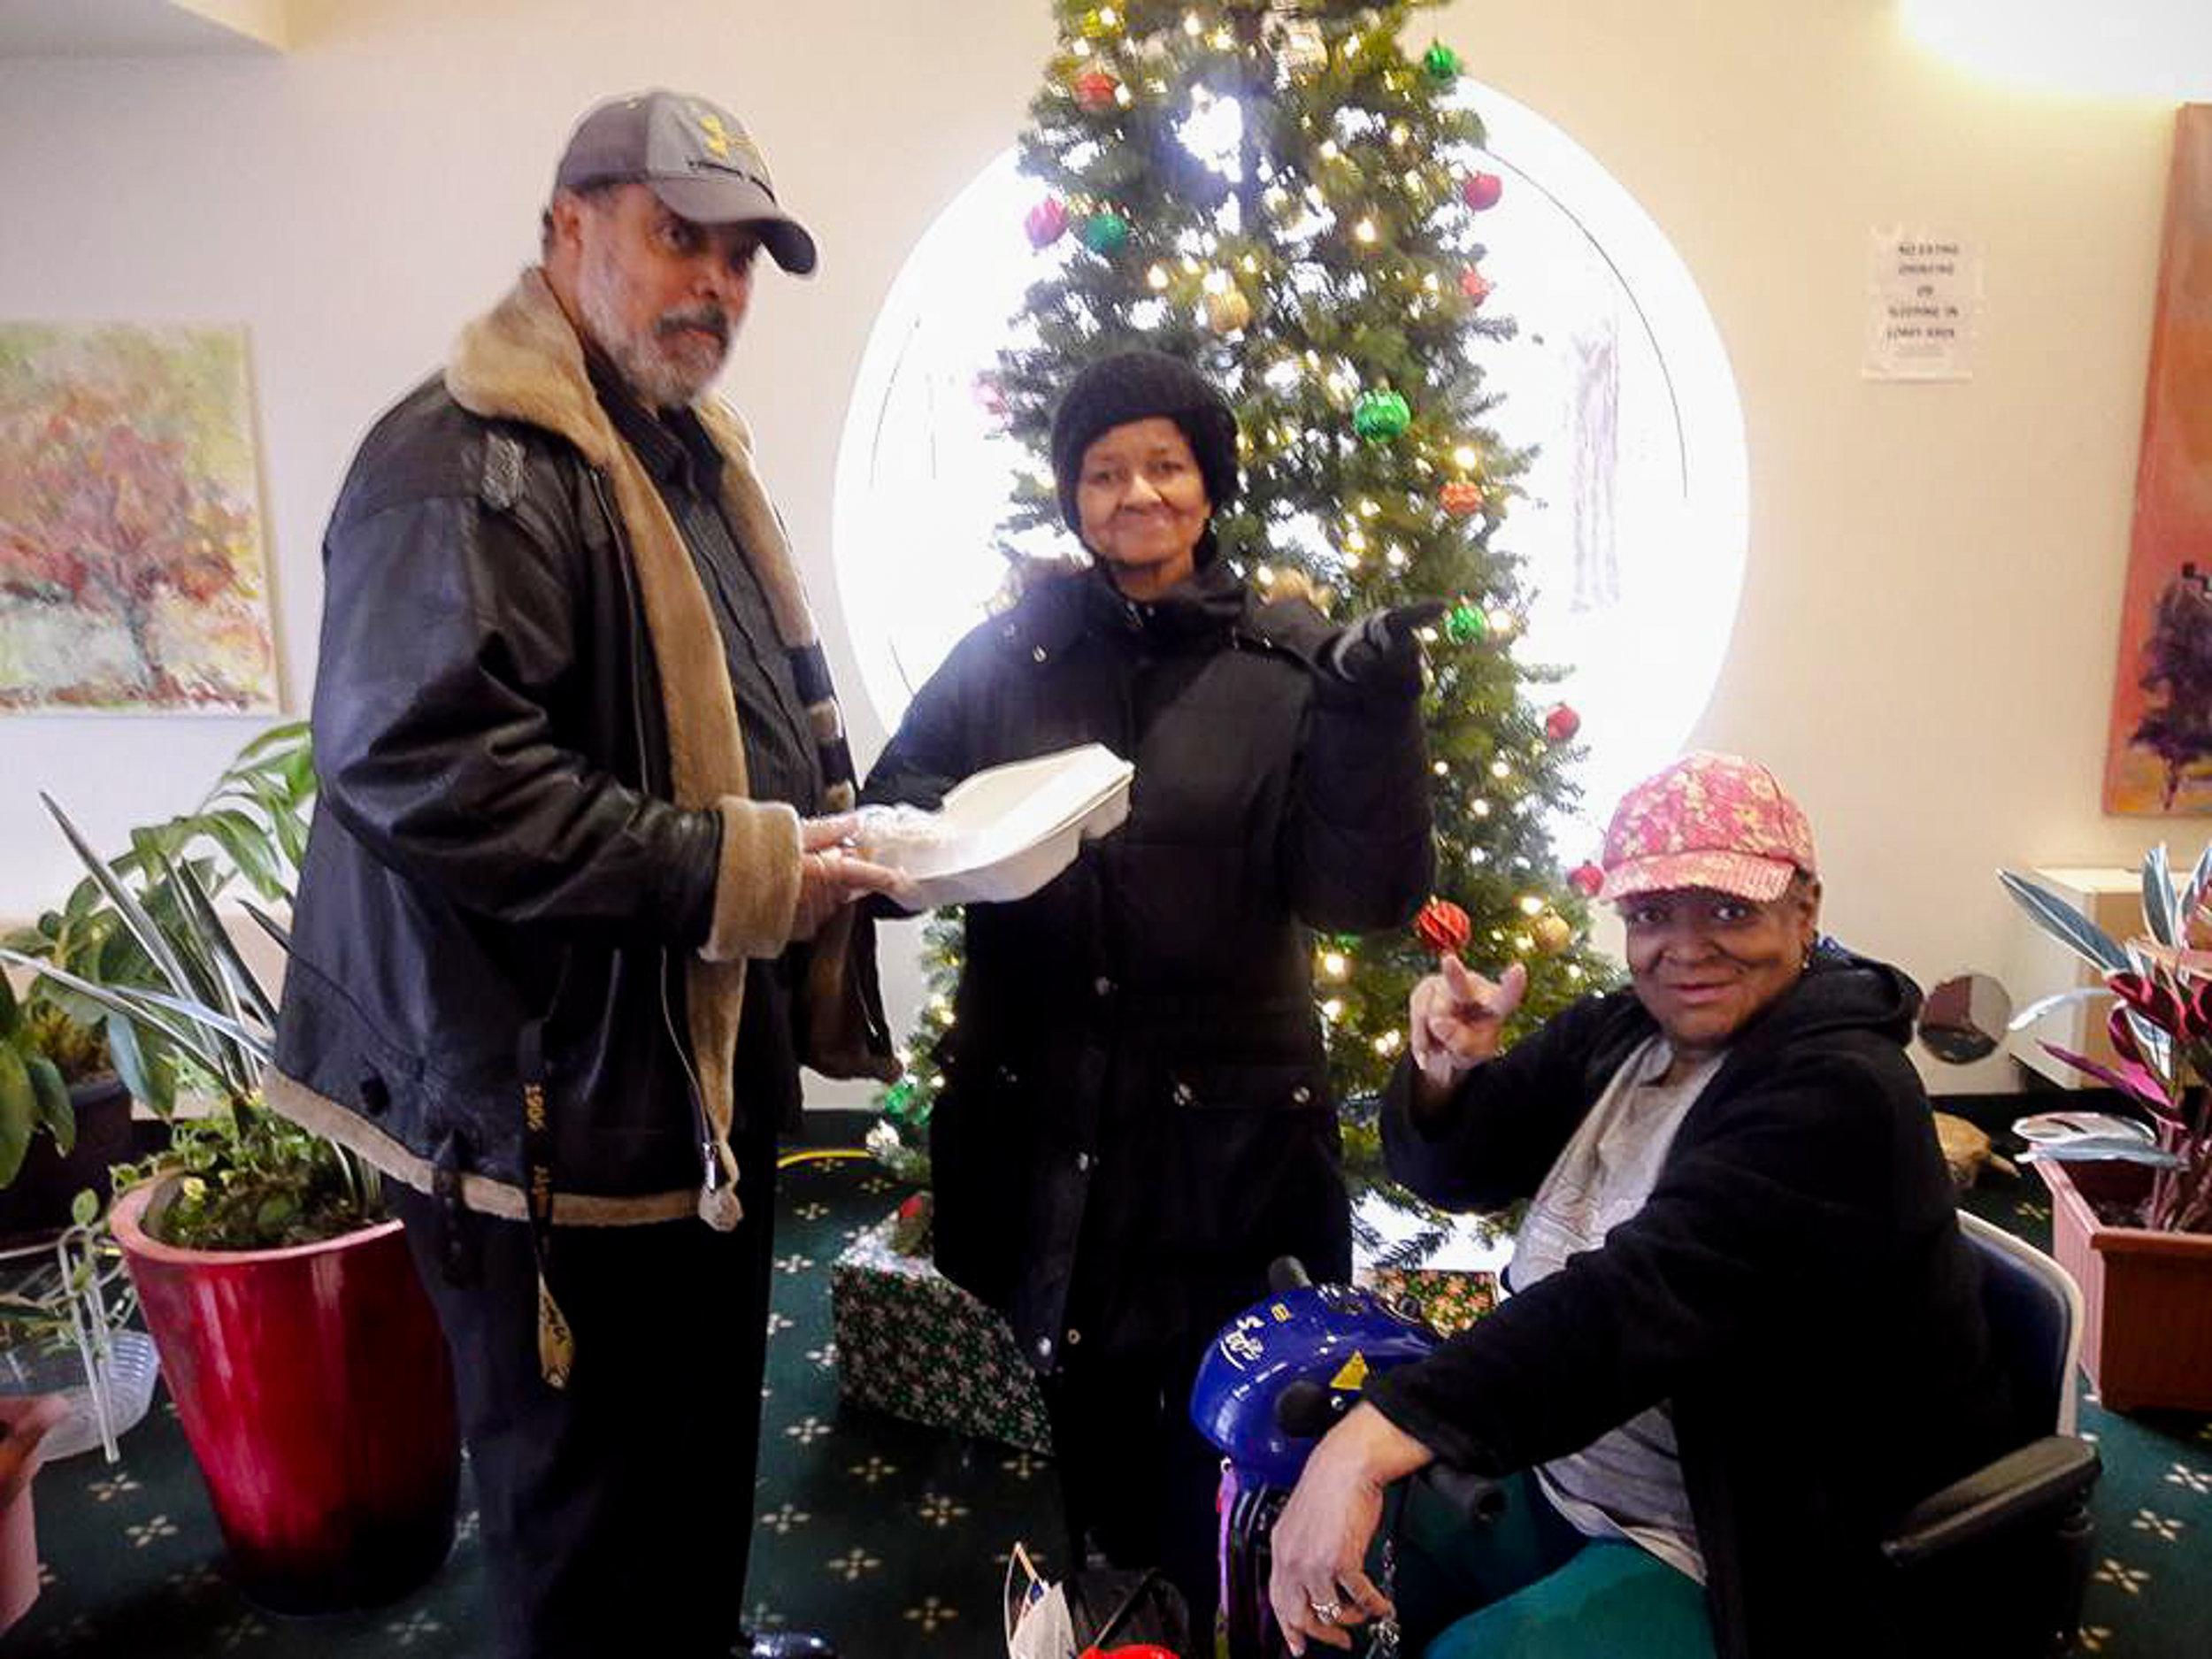 Thanksgiving-Detroit-Downriver-APRI-Michigan-lifestyle-ChettaraTPhotography--2.jpg